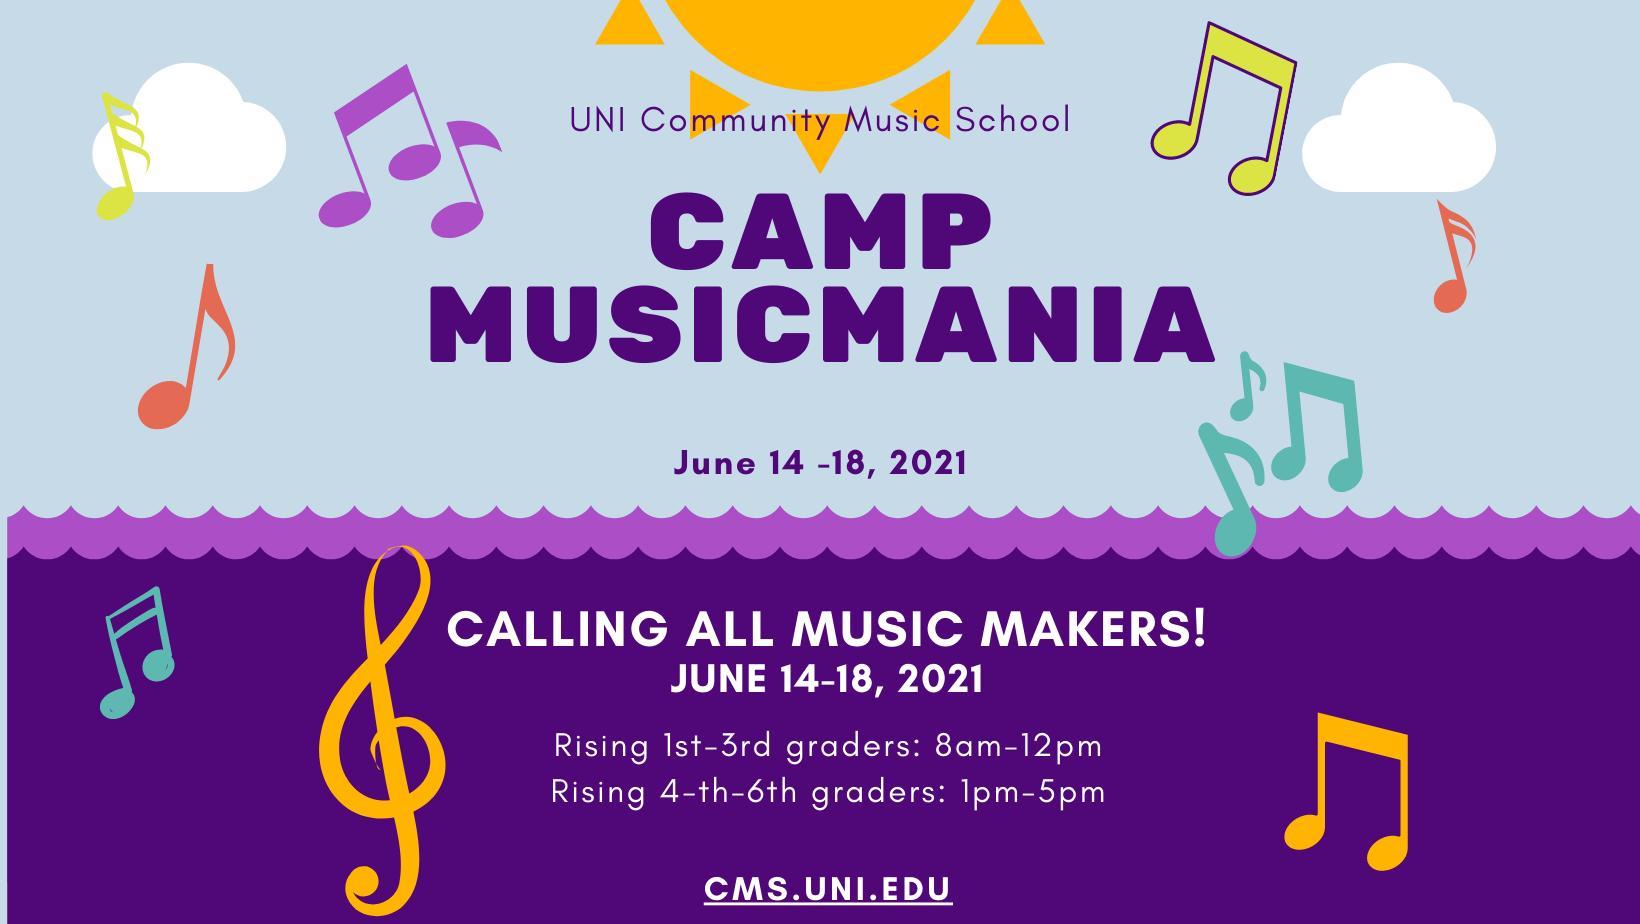 Camp Musicmania, June 14-18, 2021